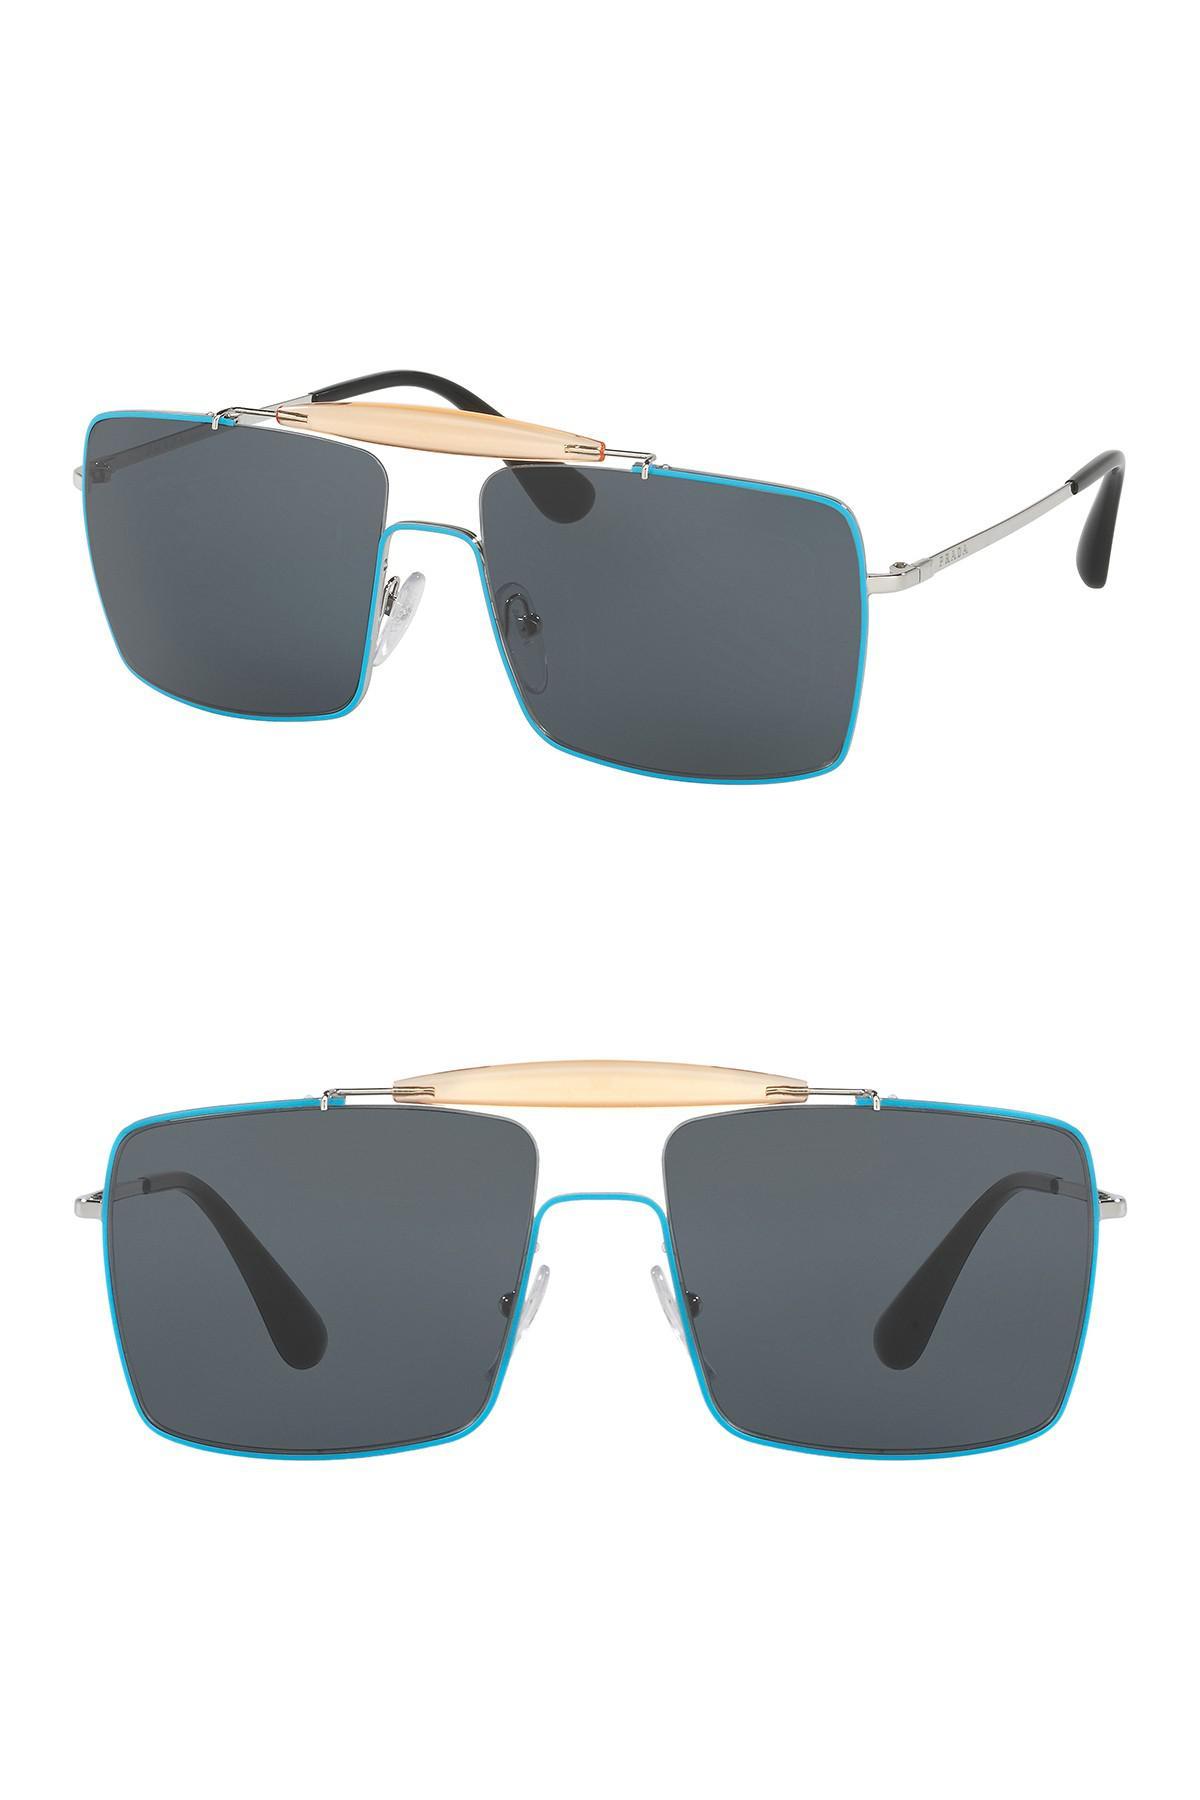 9031291c15b6 Lyst - Prada Men s Catwalk Square Top 58mm Sunglasses in Blue for Men